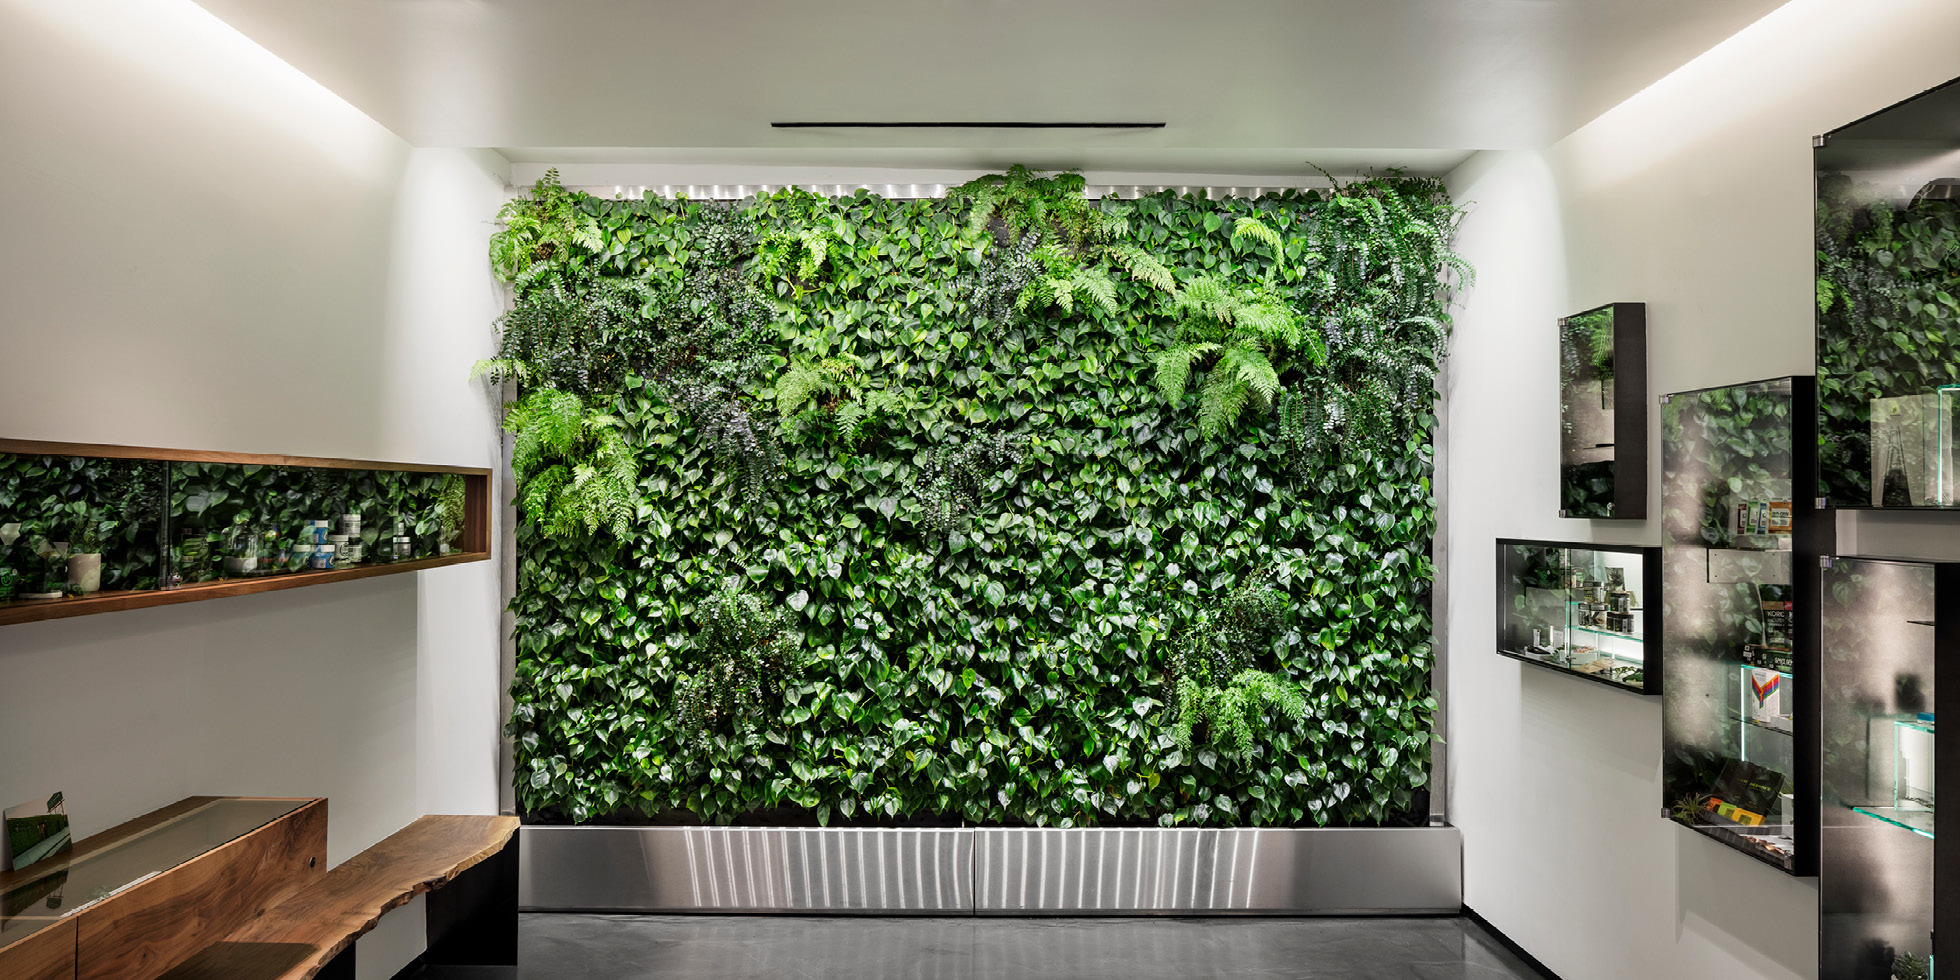 Garden of Eden  Living Wall by Habitat Horticulture - View 1